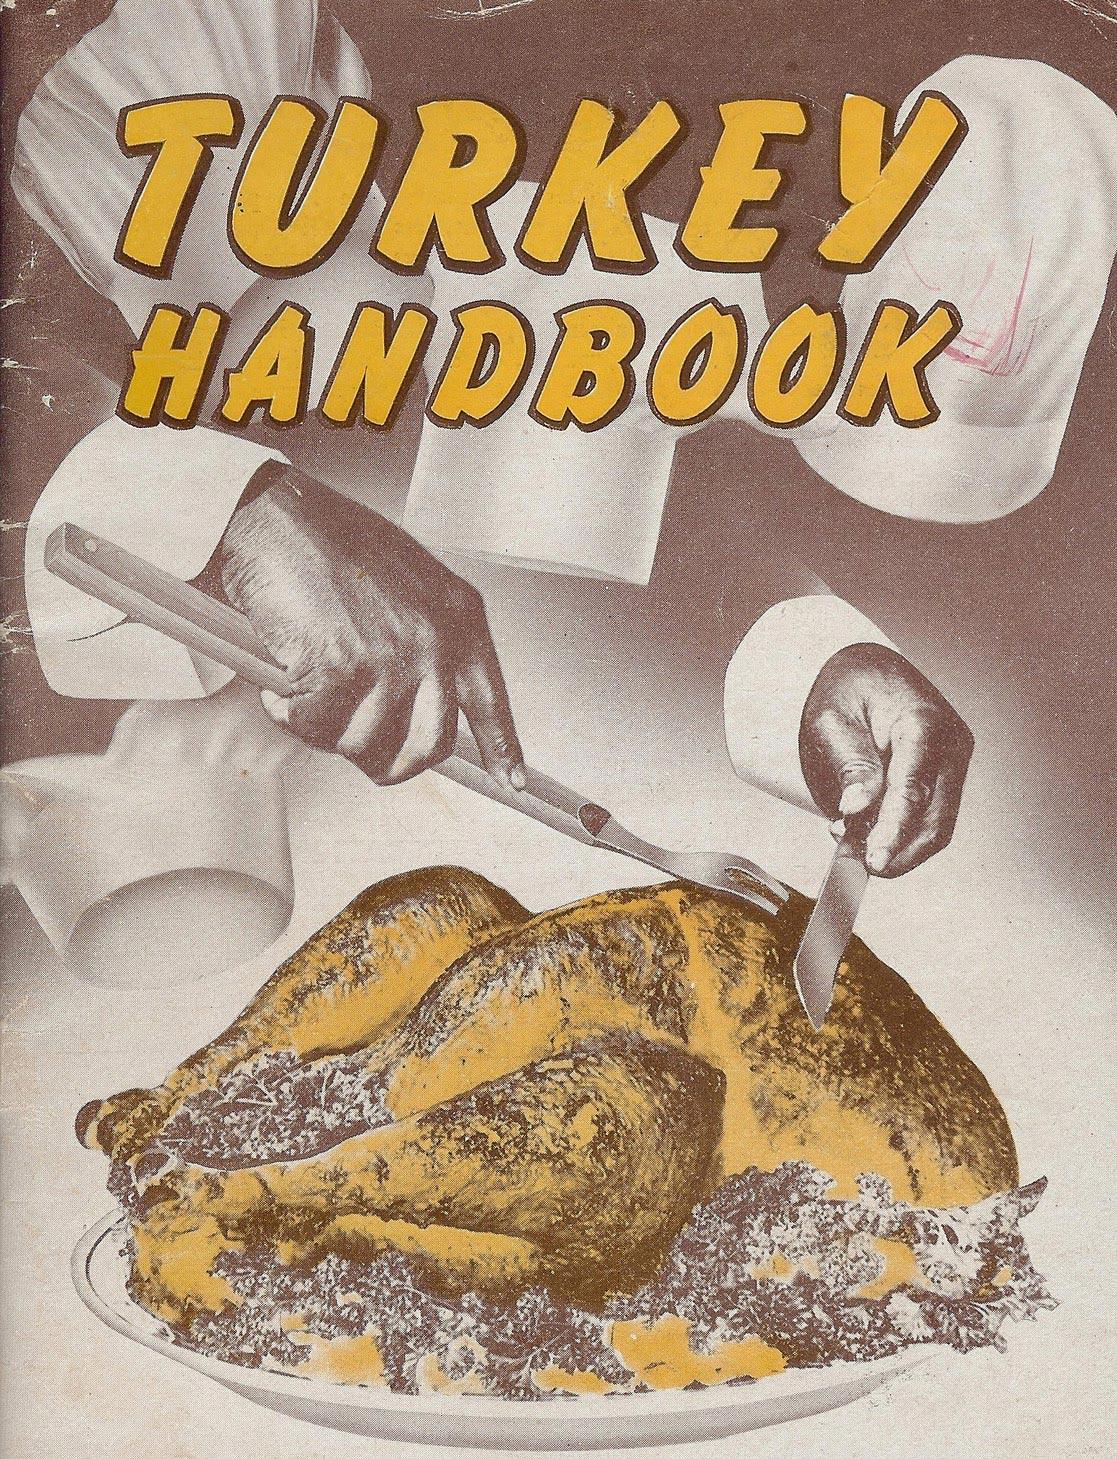 Turkey-handbook